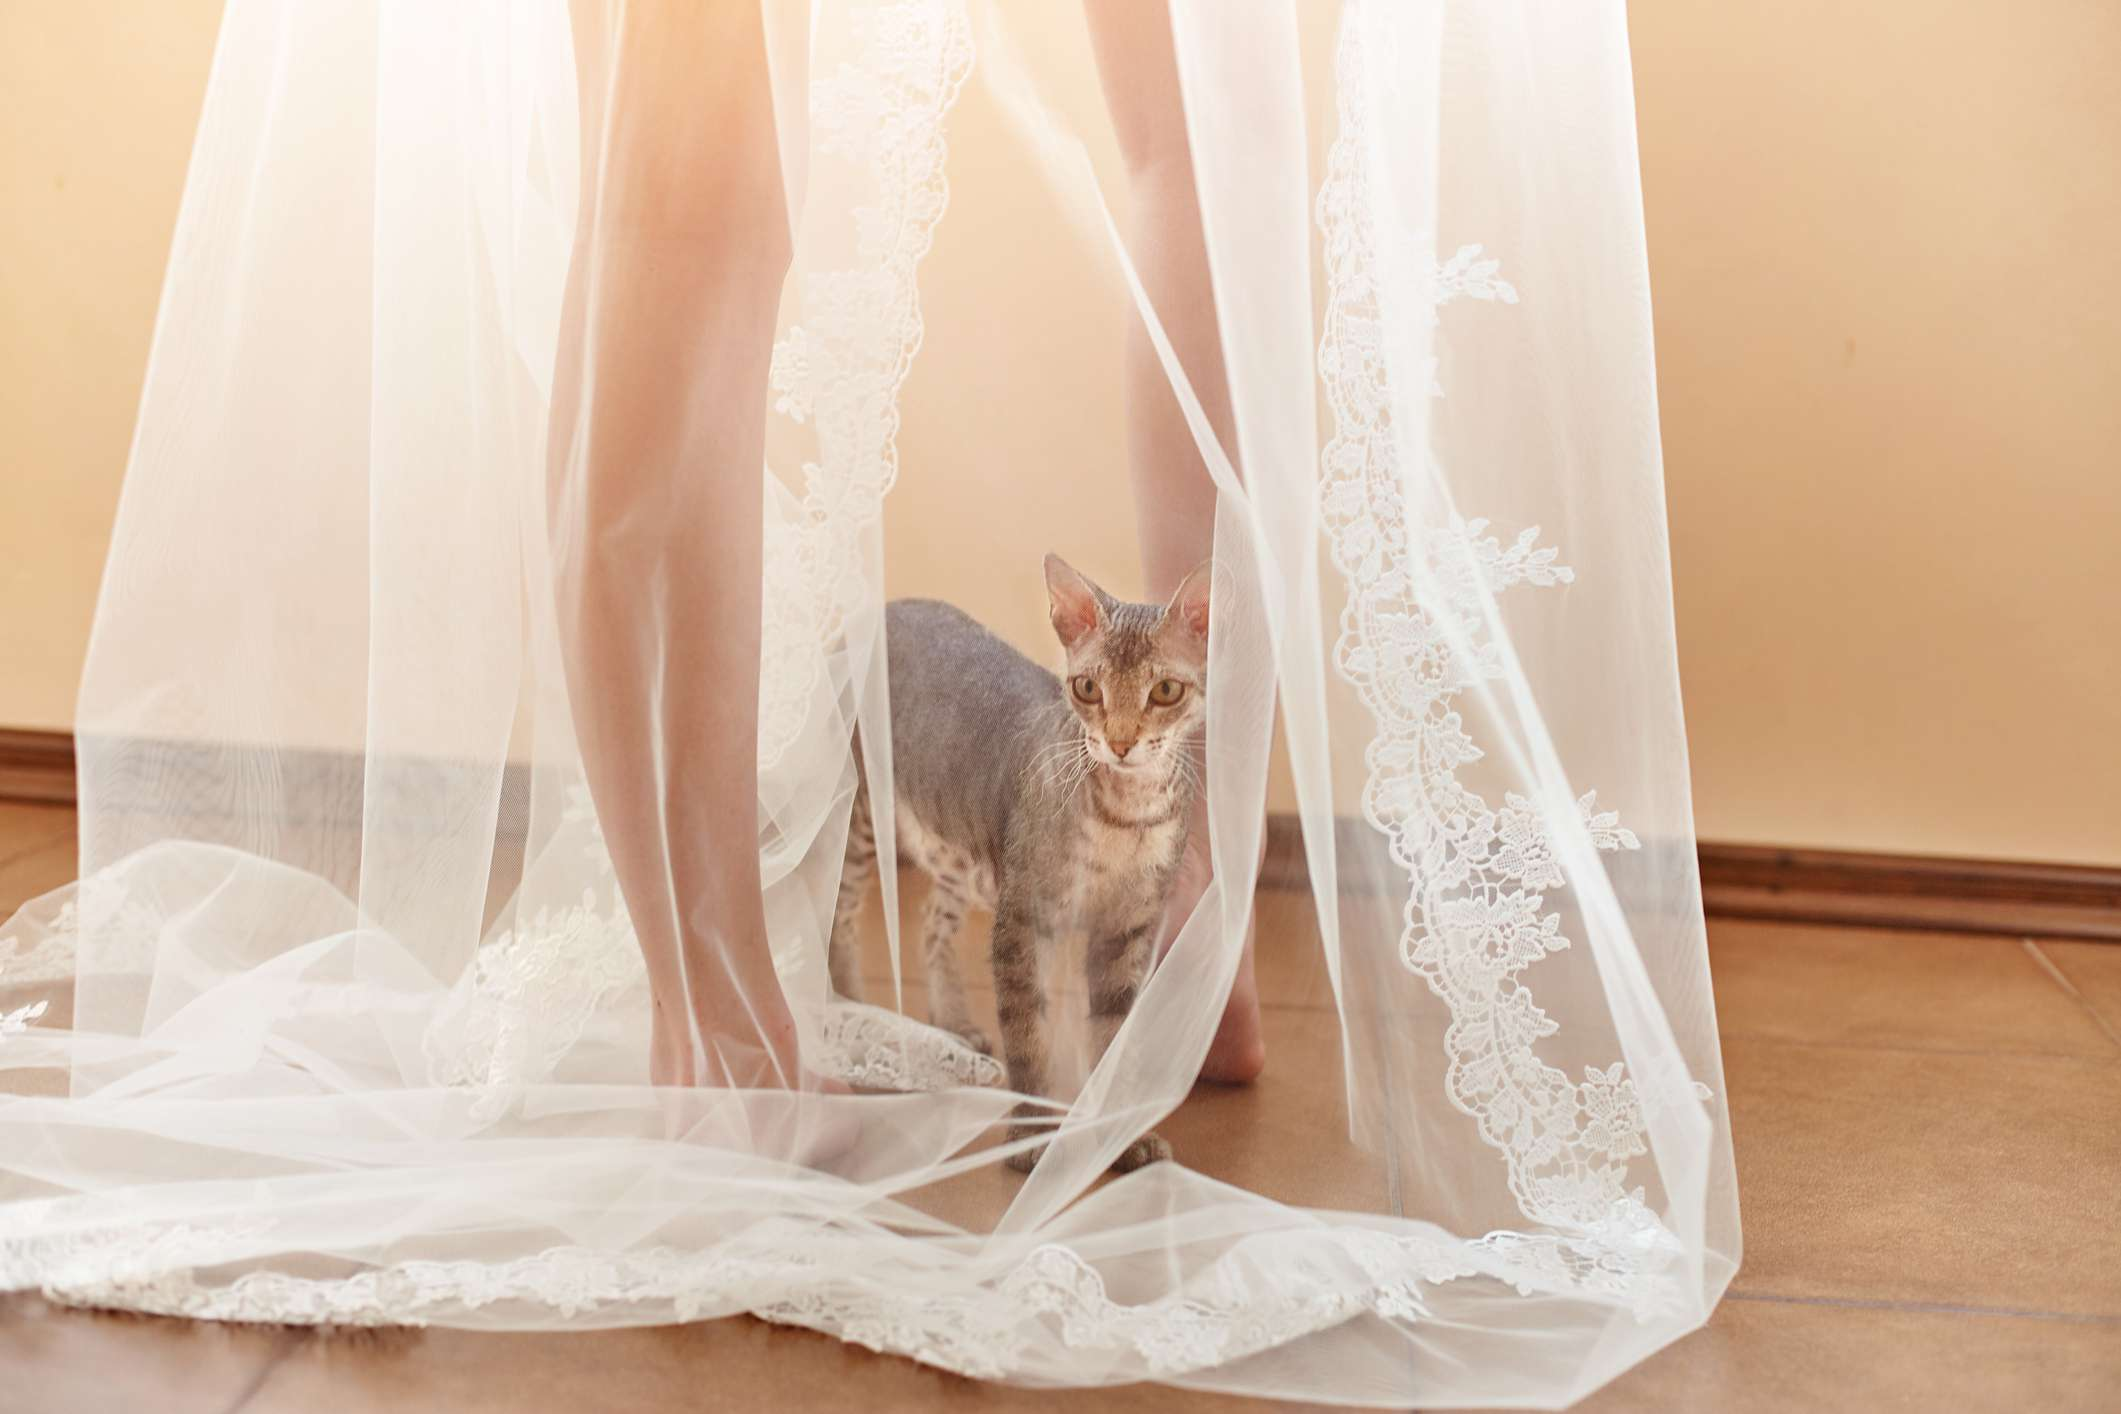 A small Minskin cat at a woman's feet underneath a sheer dress.